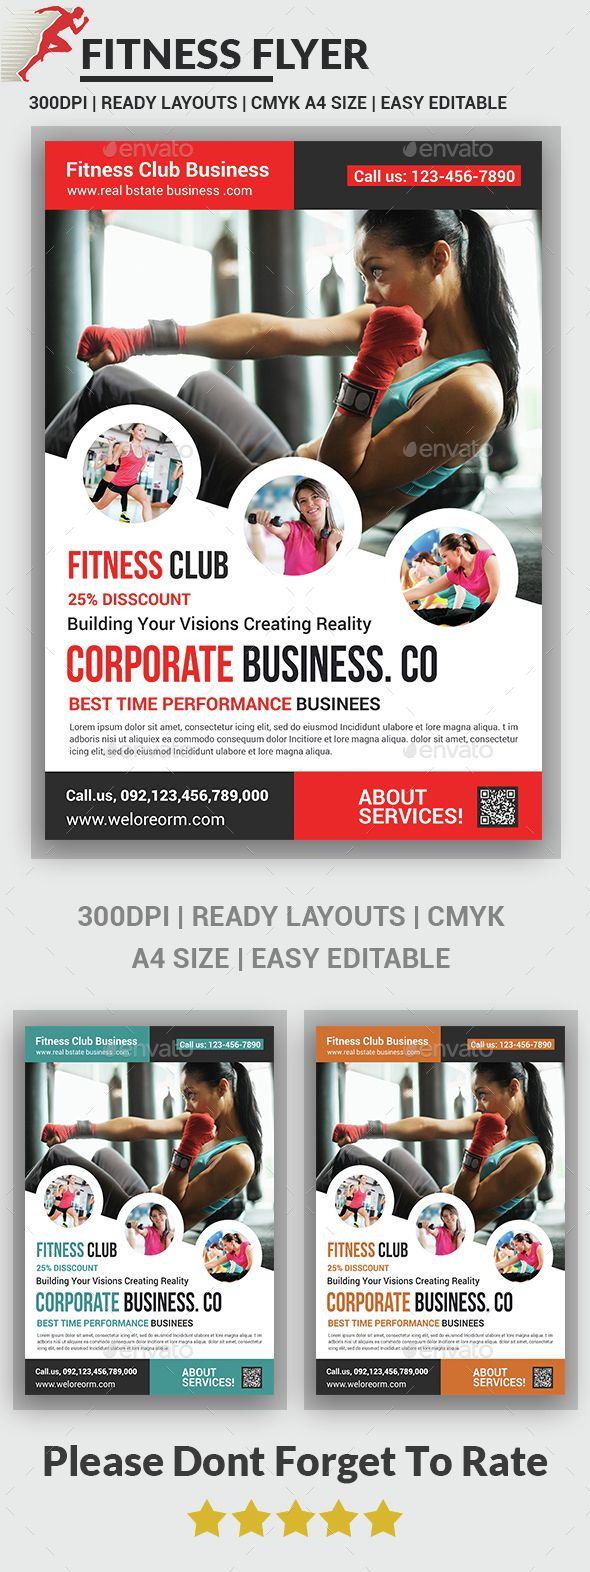 Fitness Flyer Template PSD. Download here: http://graphicriver.net/item/fitness-flyer/14617364?ref=ksioks